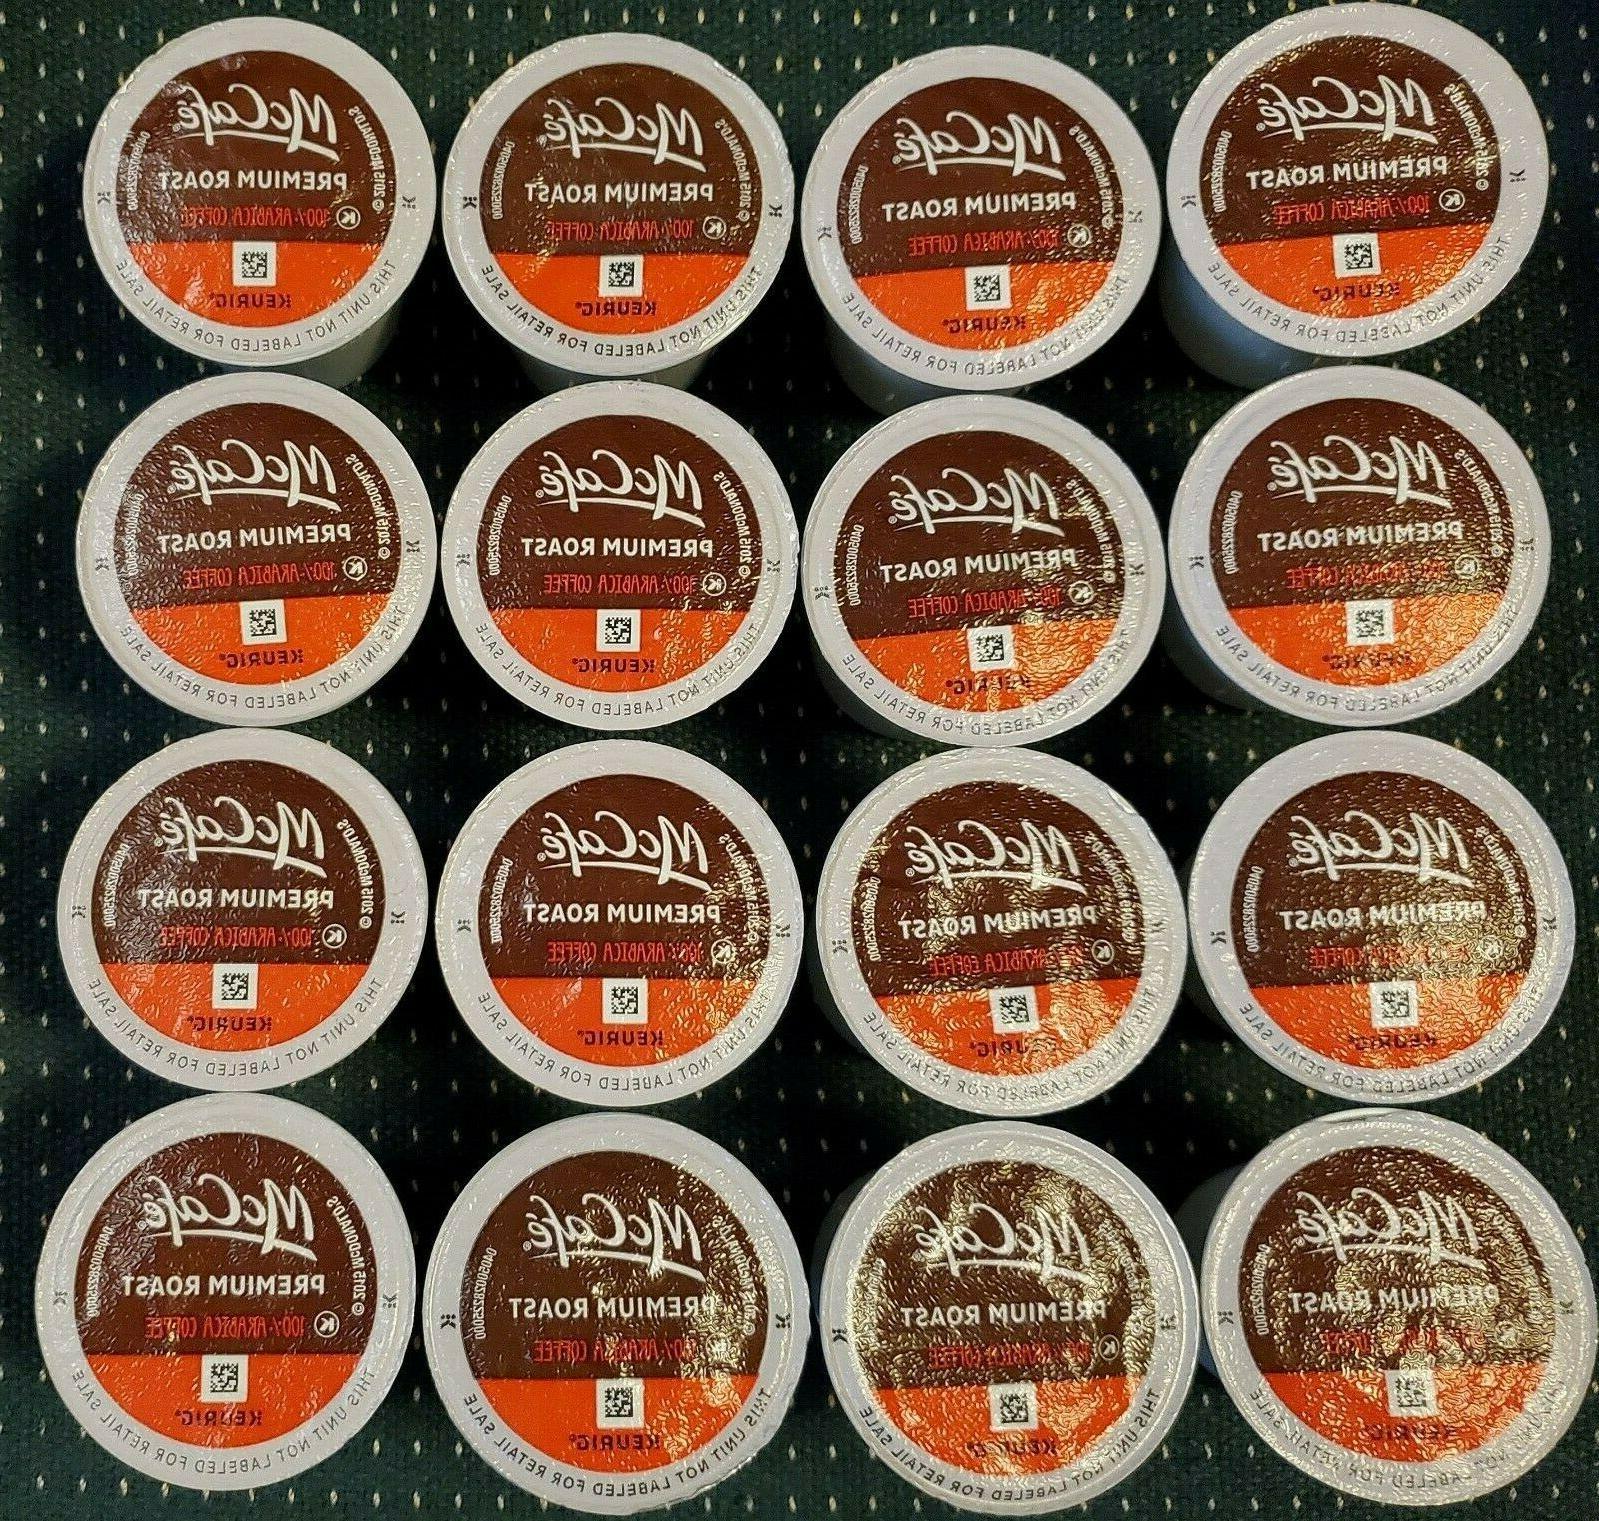 16 premium roast 100 percent arabica coffee